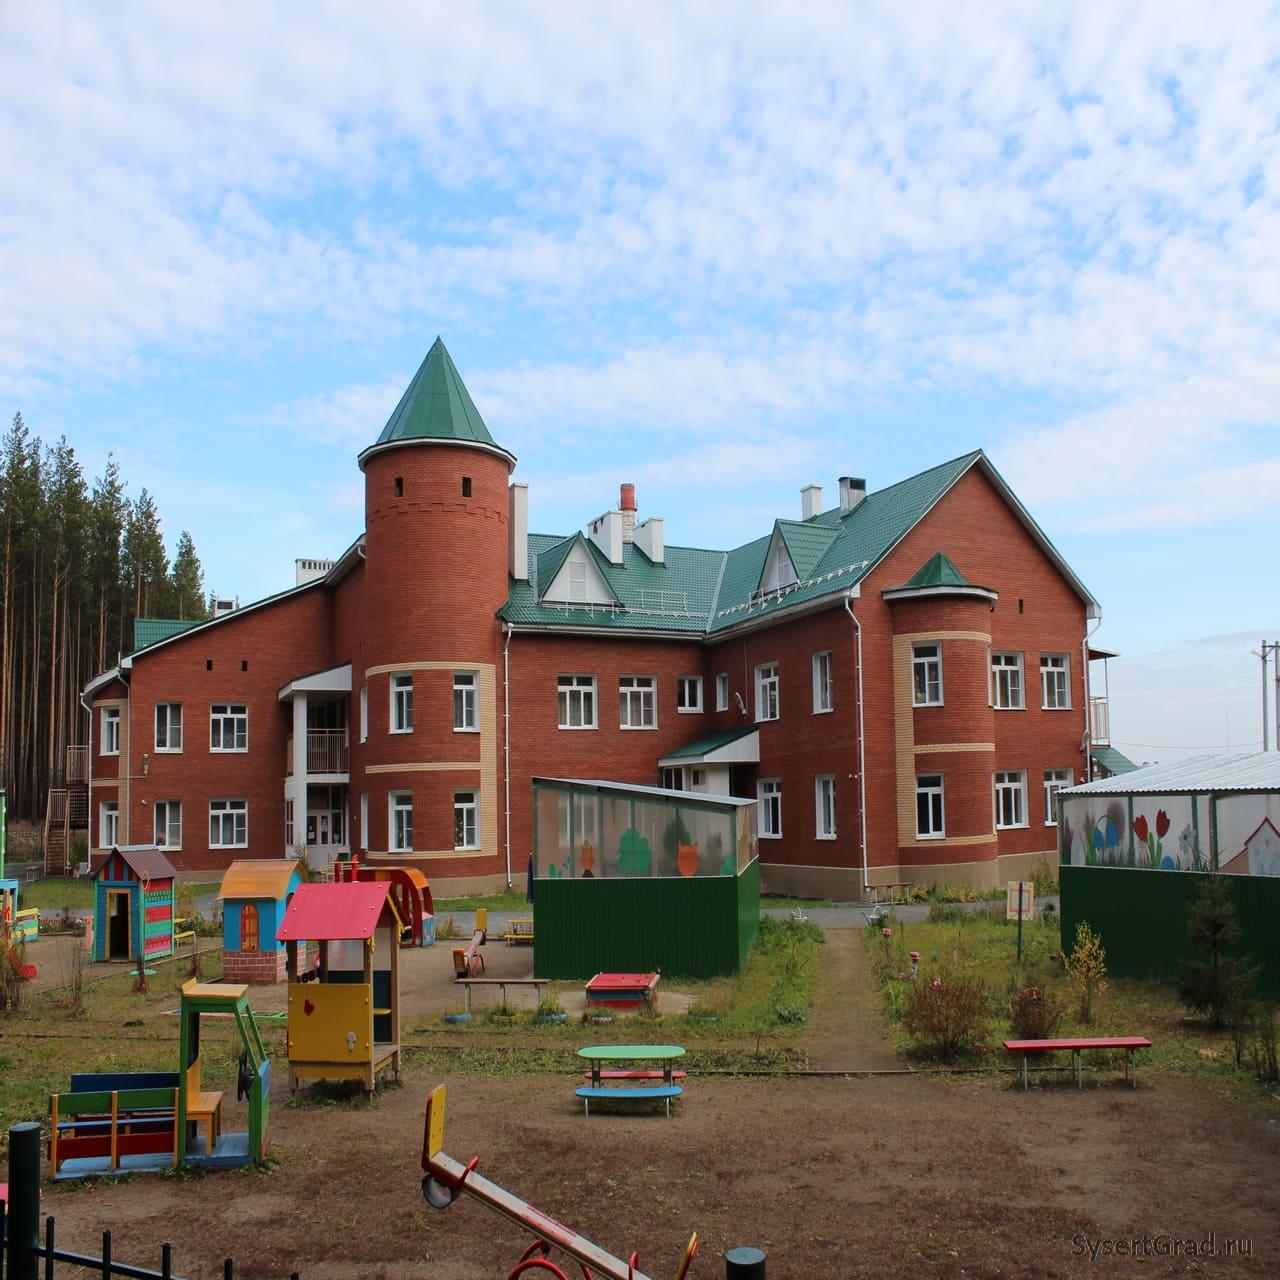 Детский сад № 2 Улыбка 1